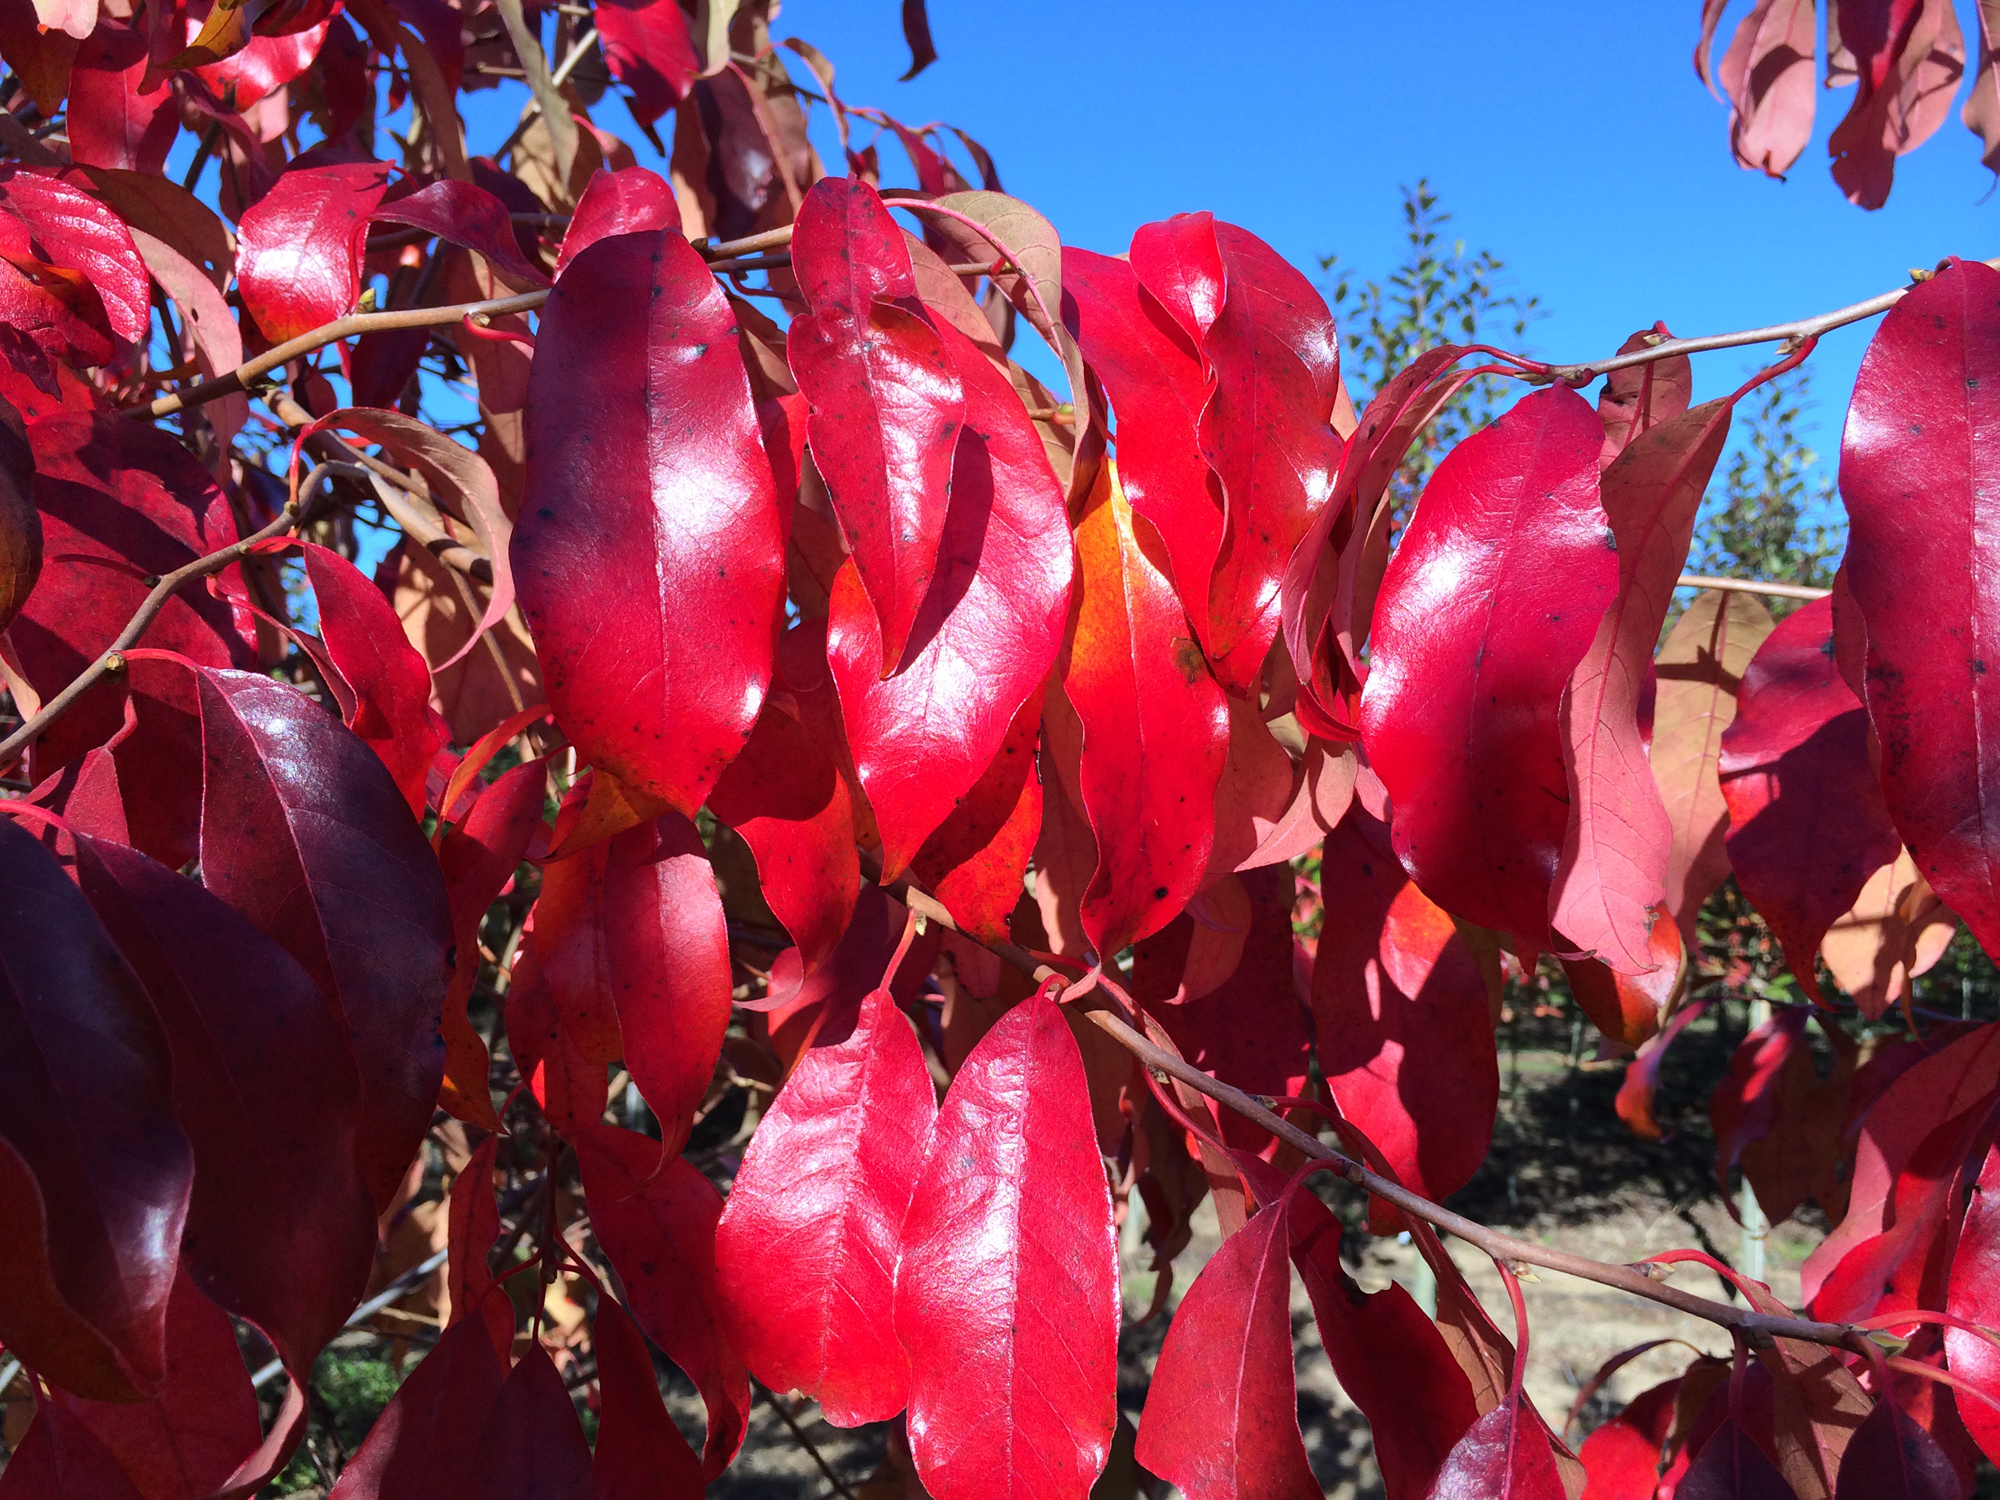 White-Chapel-Tupelo-Nyssa-sylvatica-fall-color.jpg